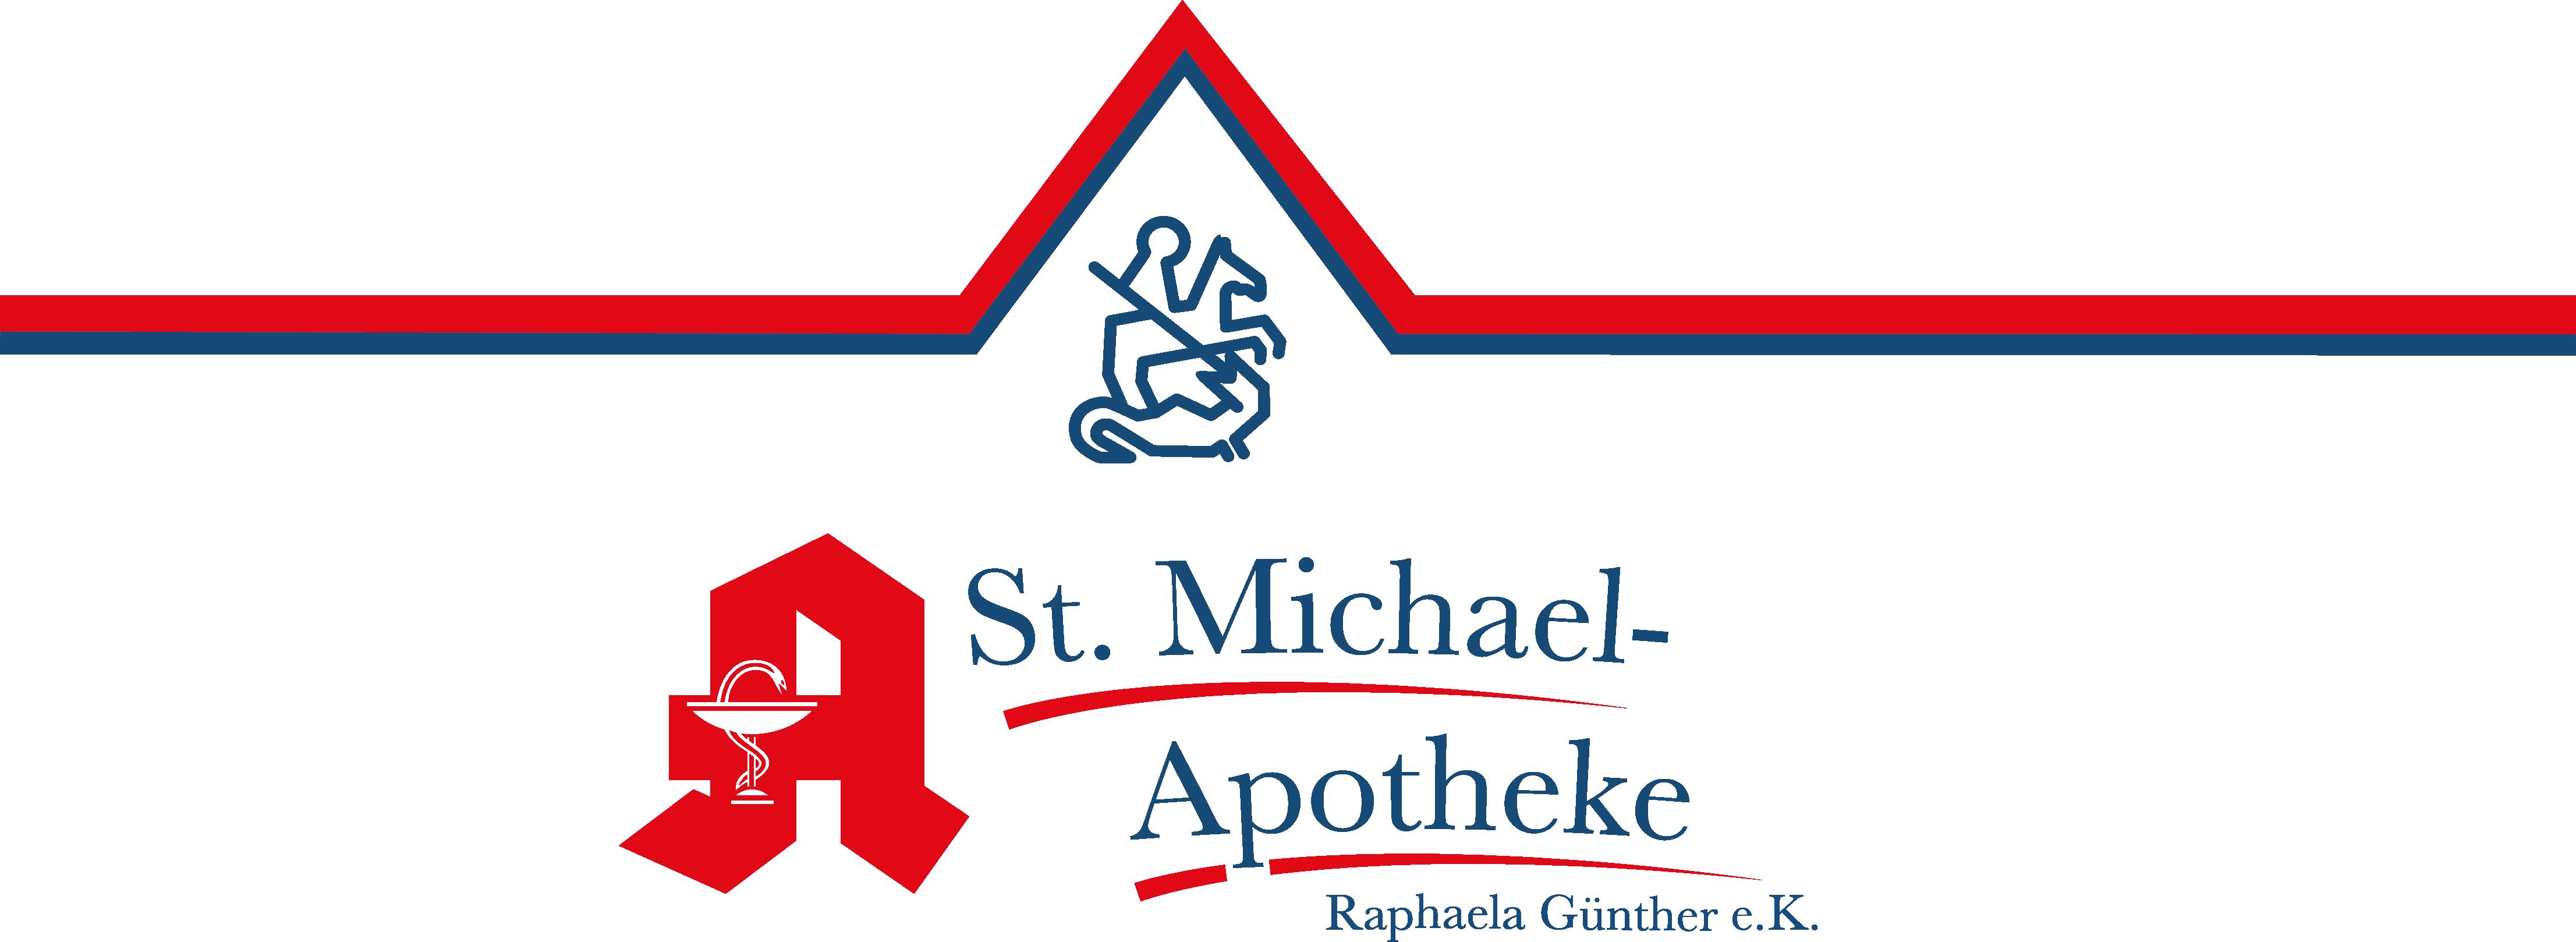 St-Michael-Apotheke-Weißenthurm